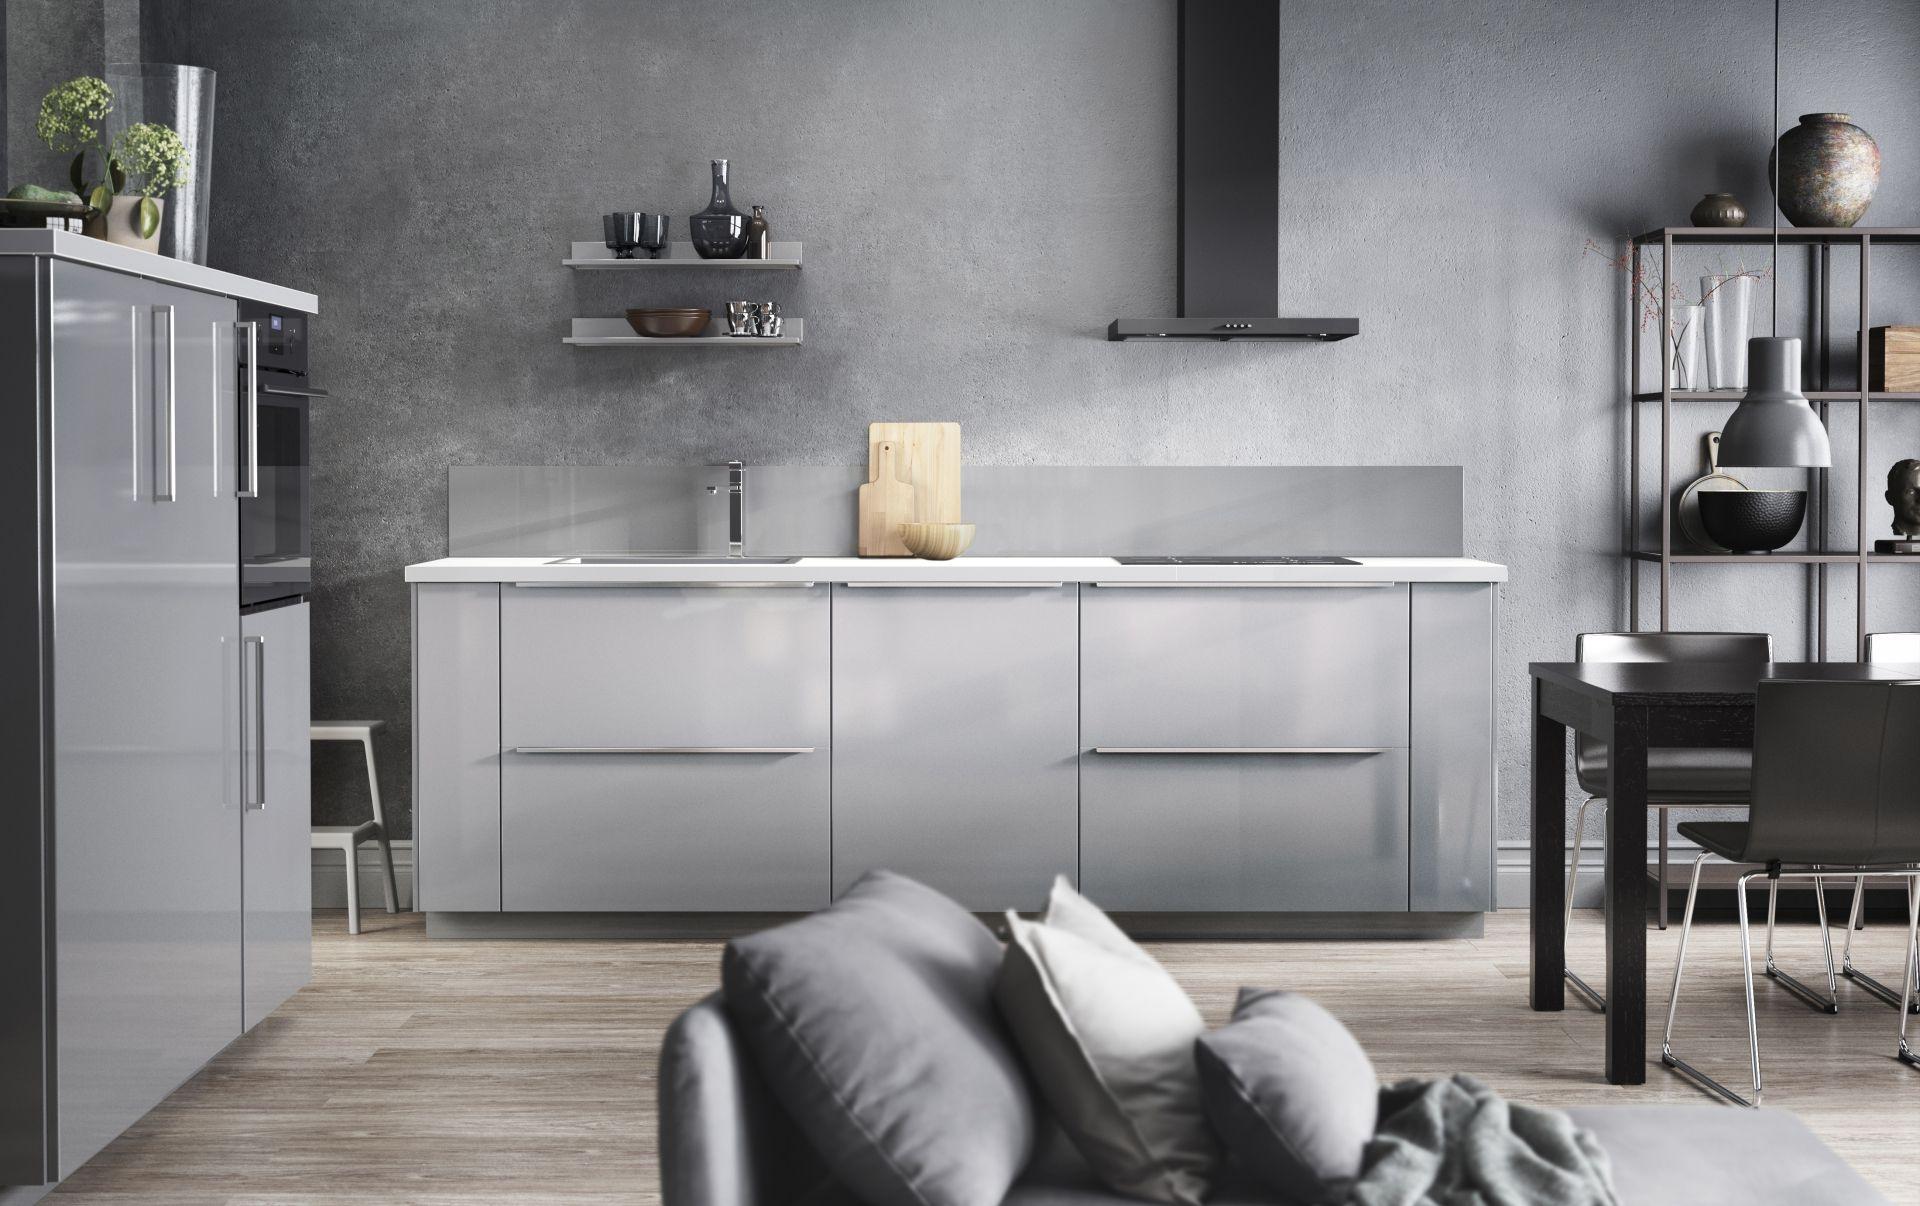 Full Size of Ikea Ringhult Hellgrau Nederland Grau Kche Minikche Sofa Mit Wohnzimmer Ringhult Hellgrau